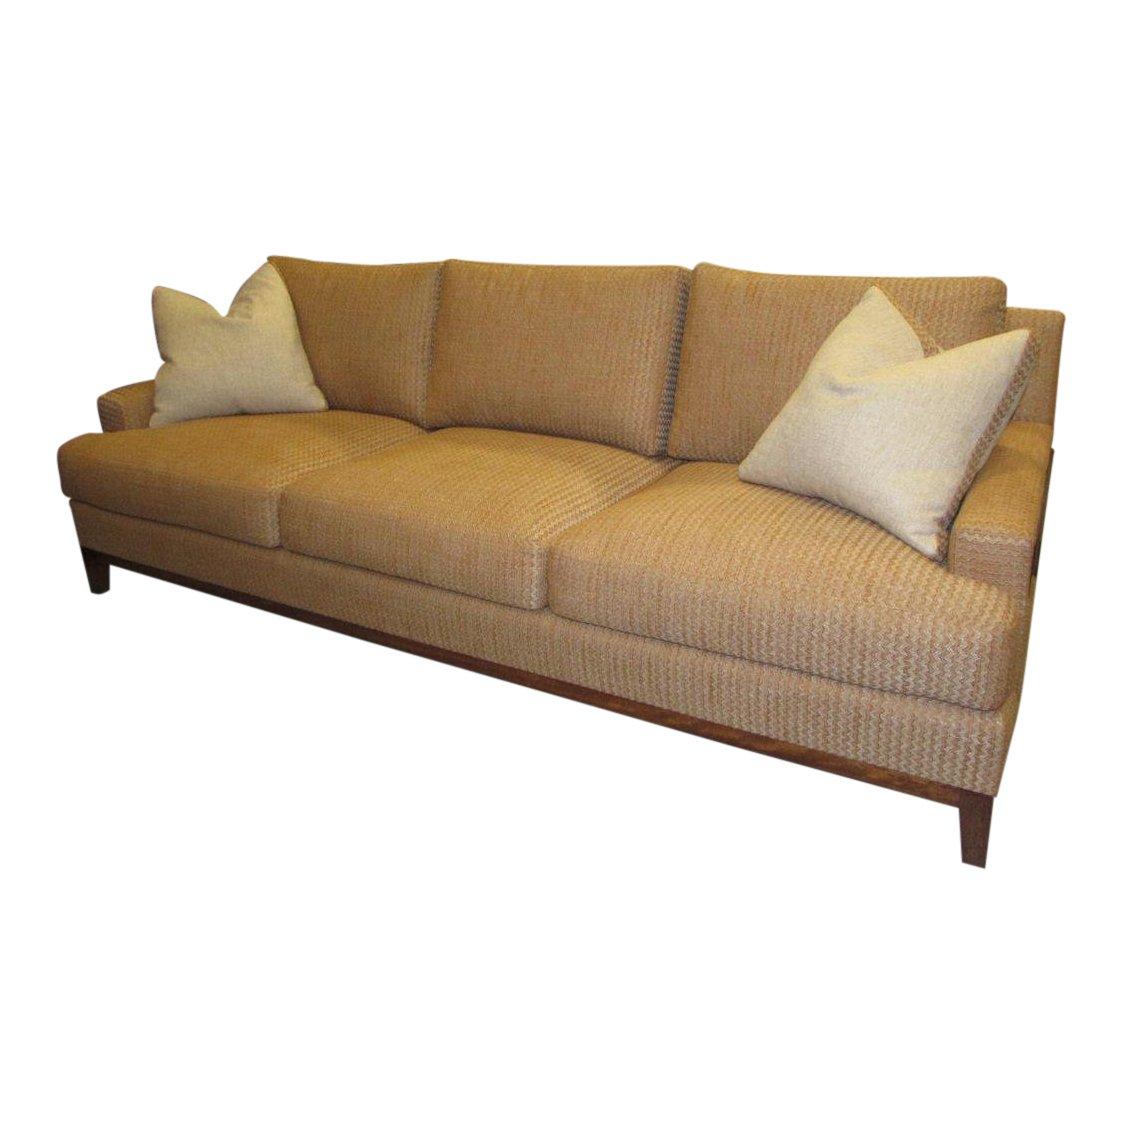 SOLD Adriana Hoyos Contemporary Sofa